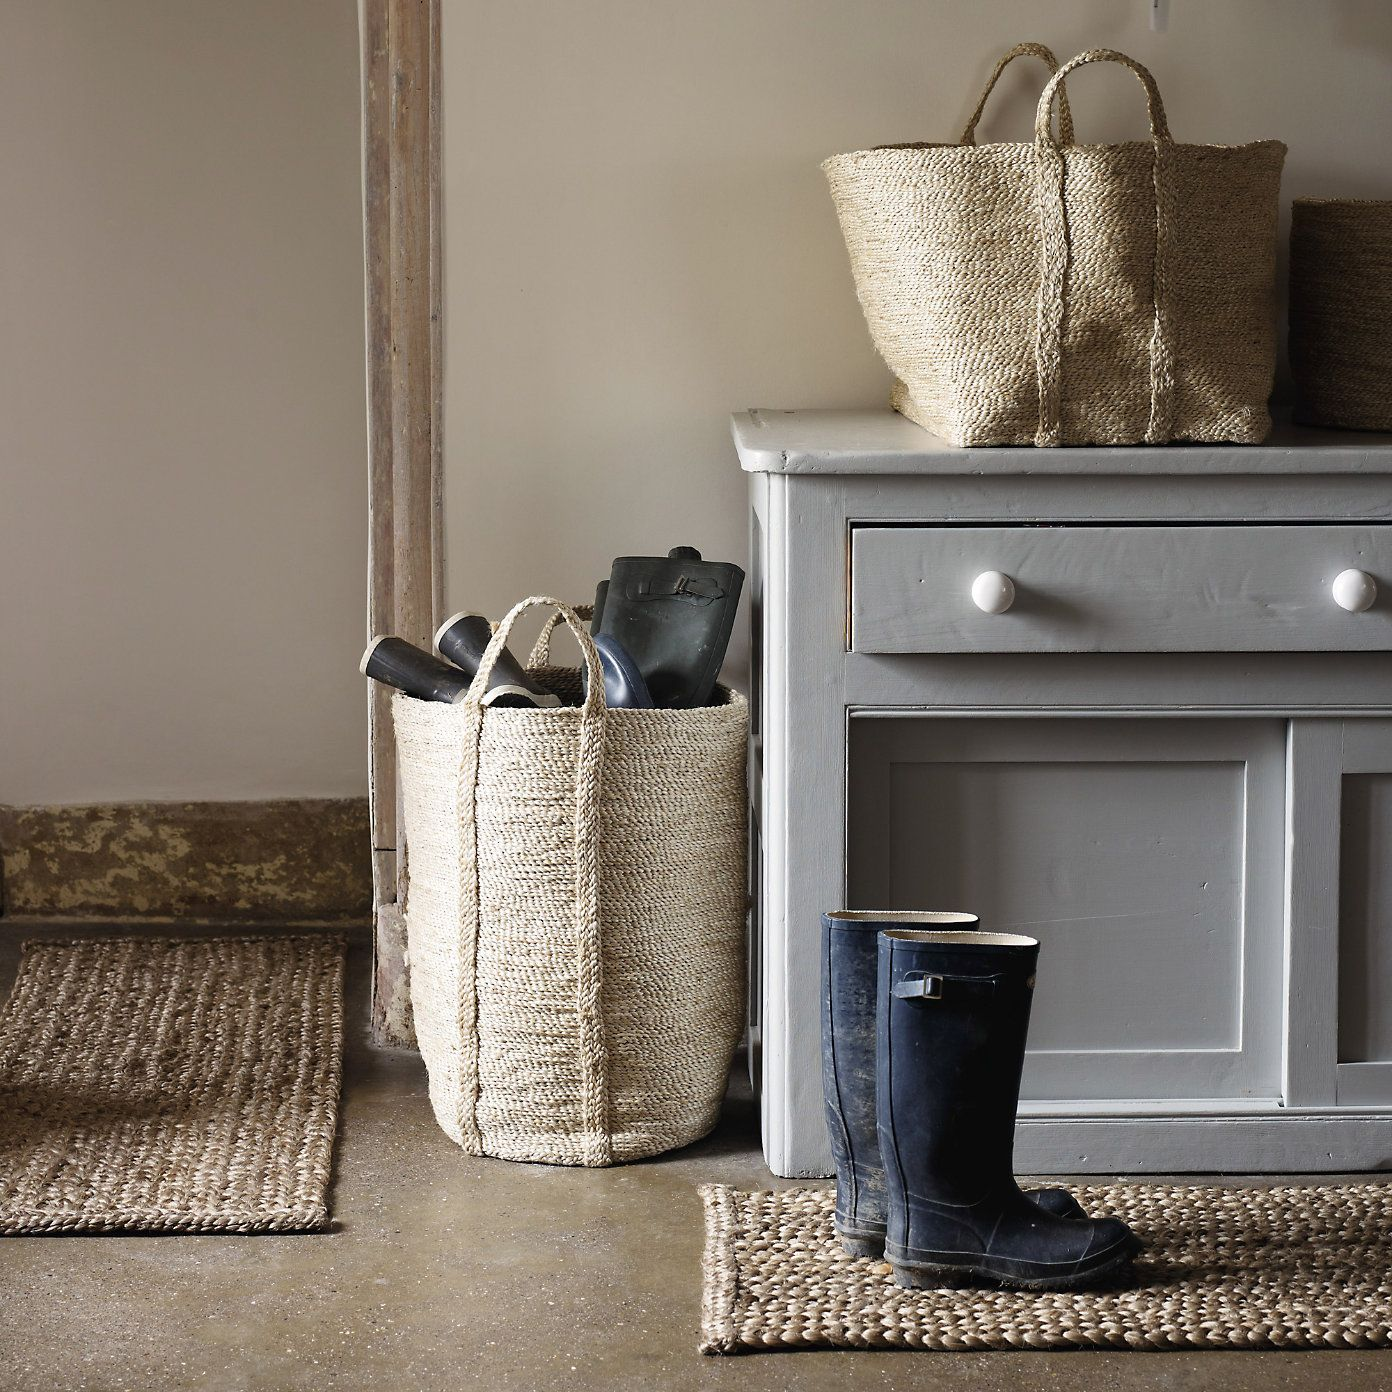 Buy Home Accessories U003e Laundry U0026 Storage U003e Large Jute Basket From The White  Company